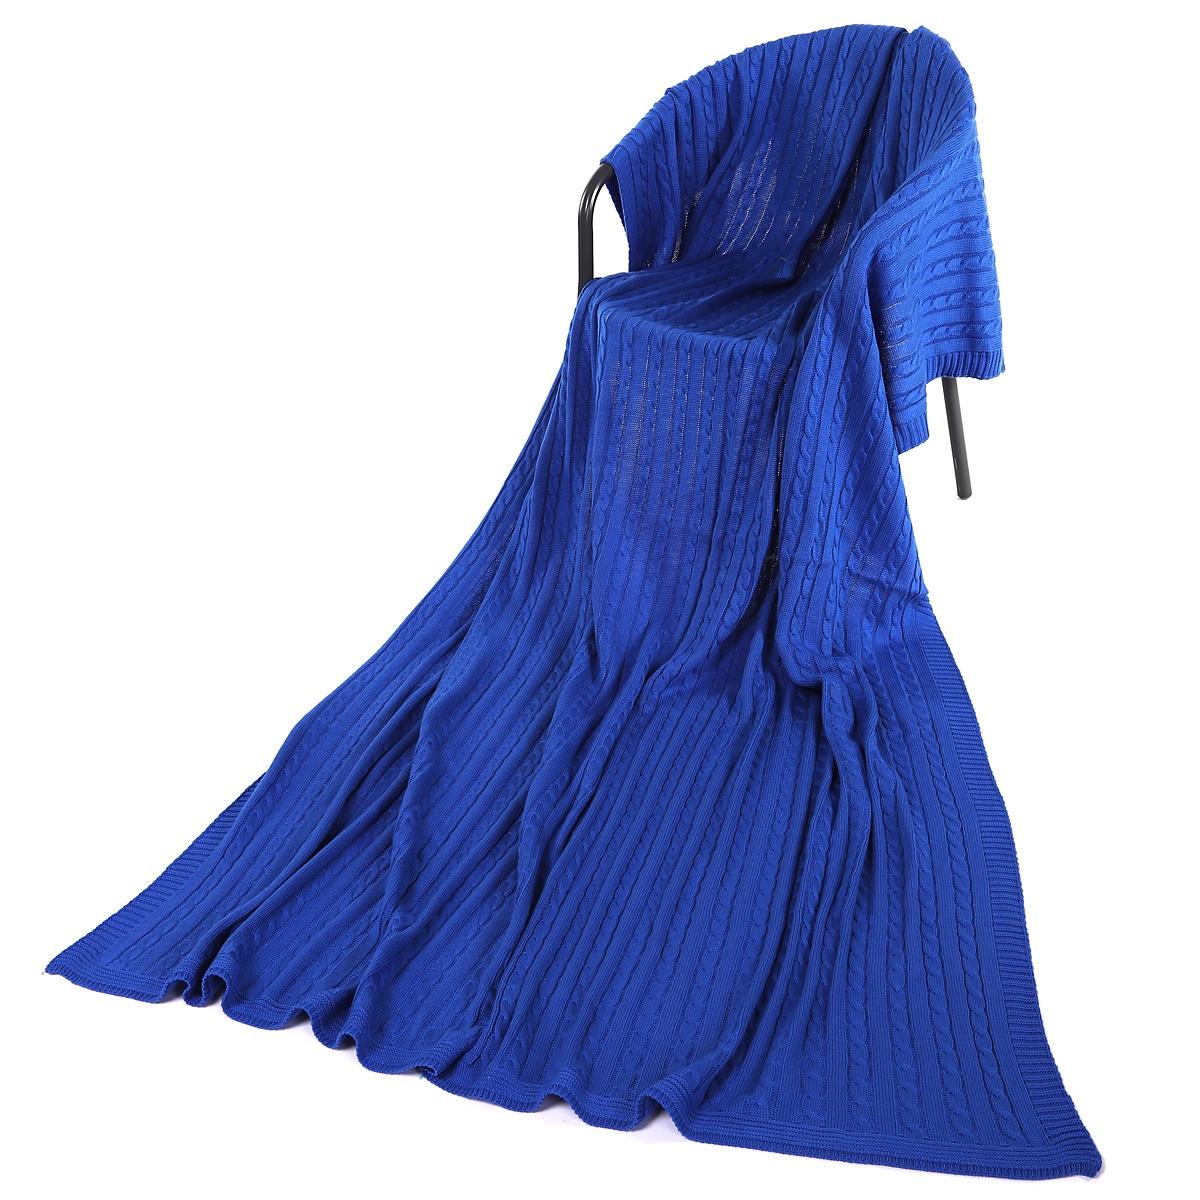 Плед ANRI АНРИ-П-3200х220079-200х220, синий